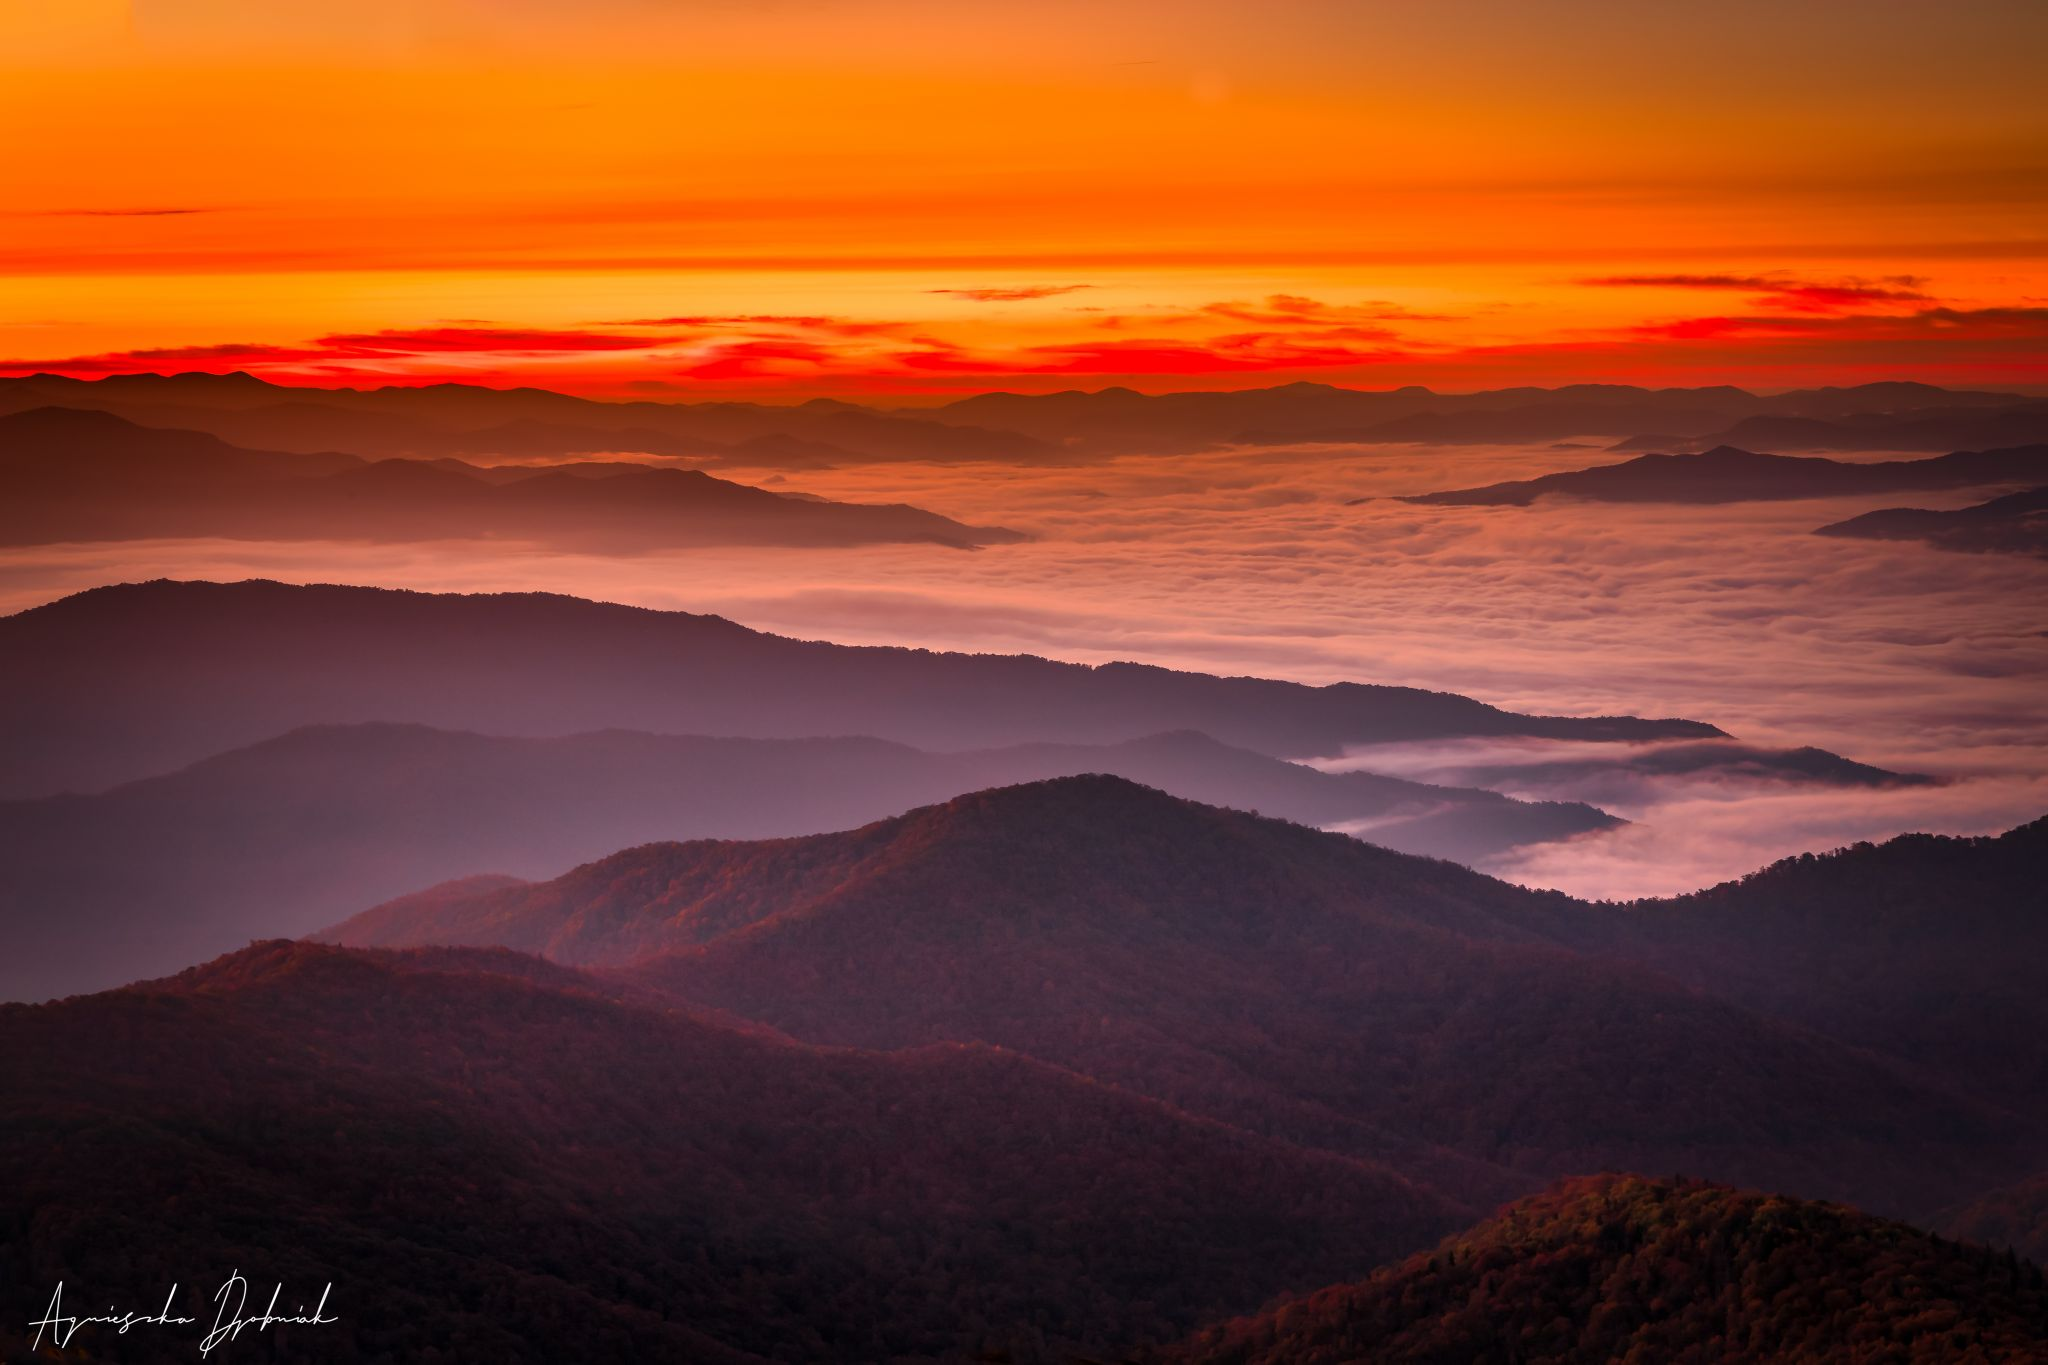 Sunrise at Clingmans Dome, USA